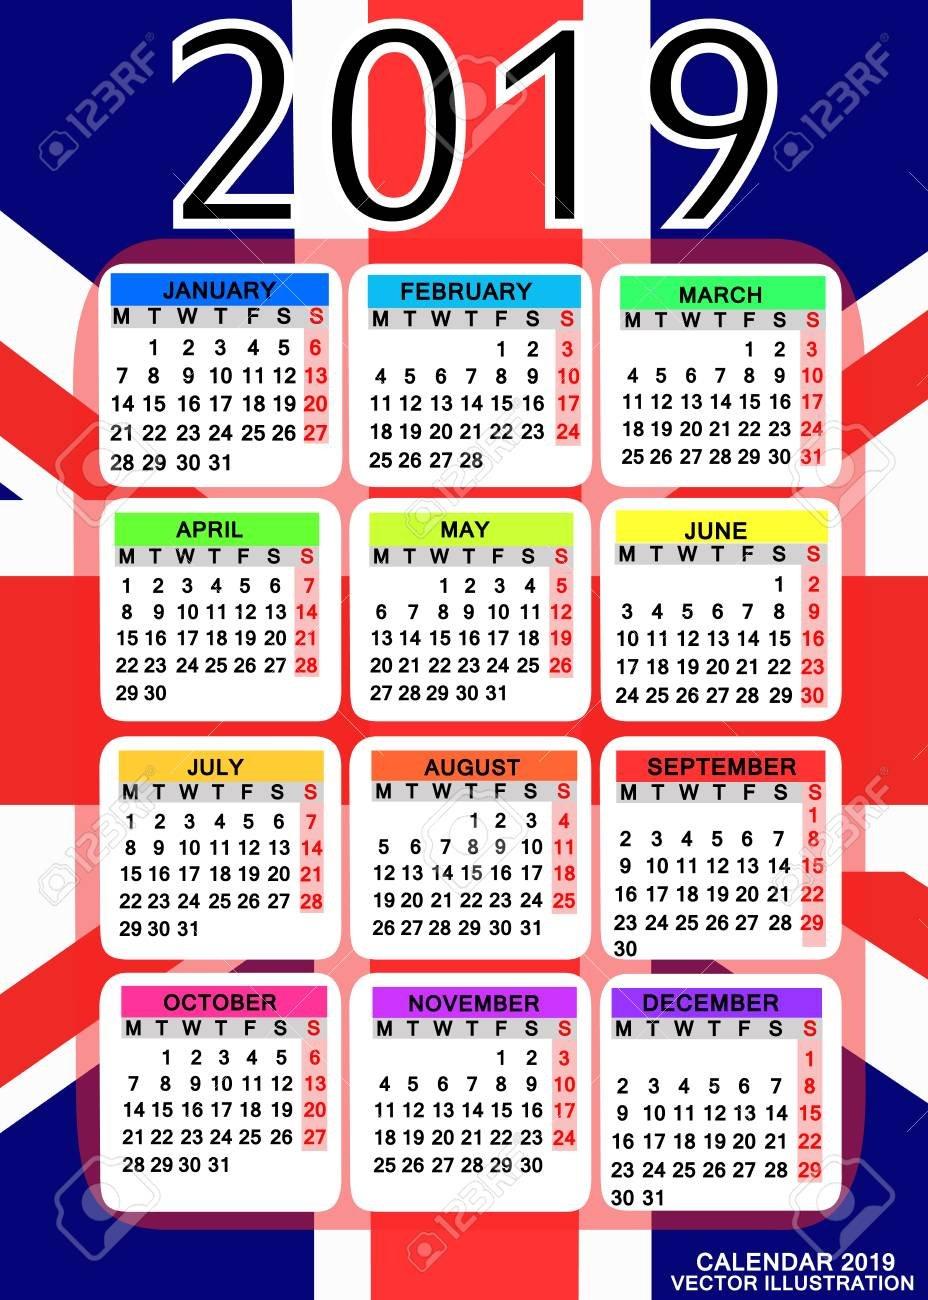 Abstract Calendar For 2019 Year With Flag Of England. Design Calendar 2019 England